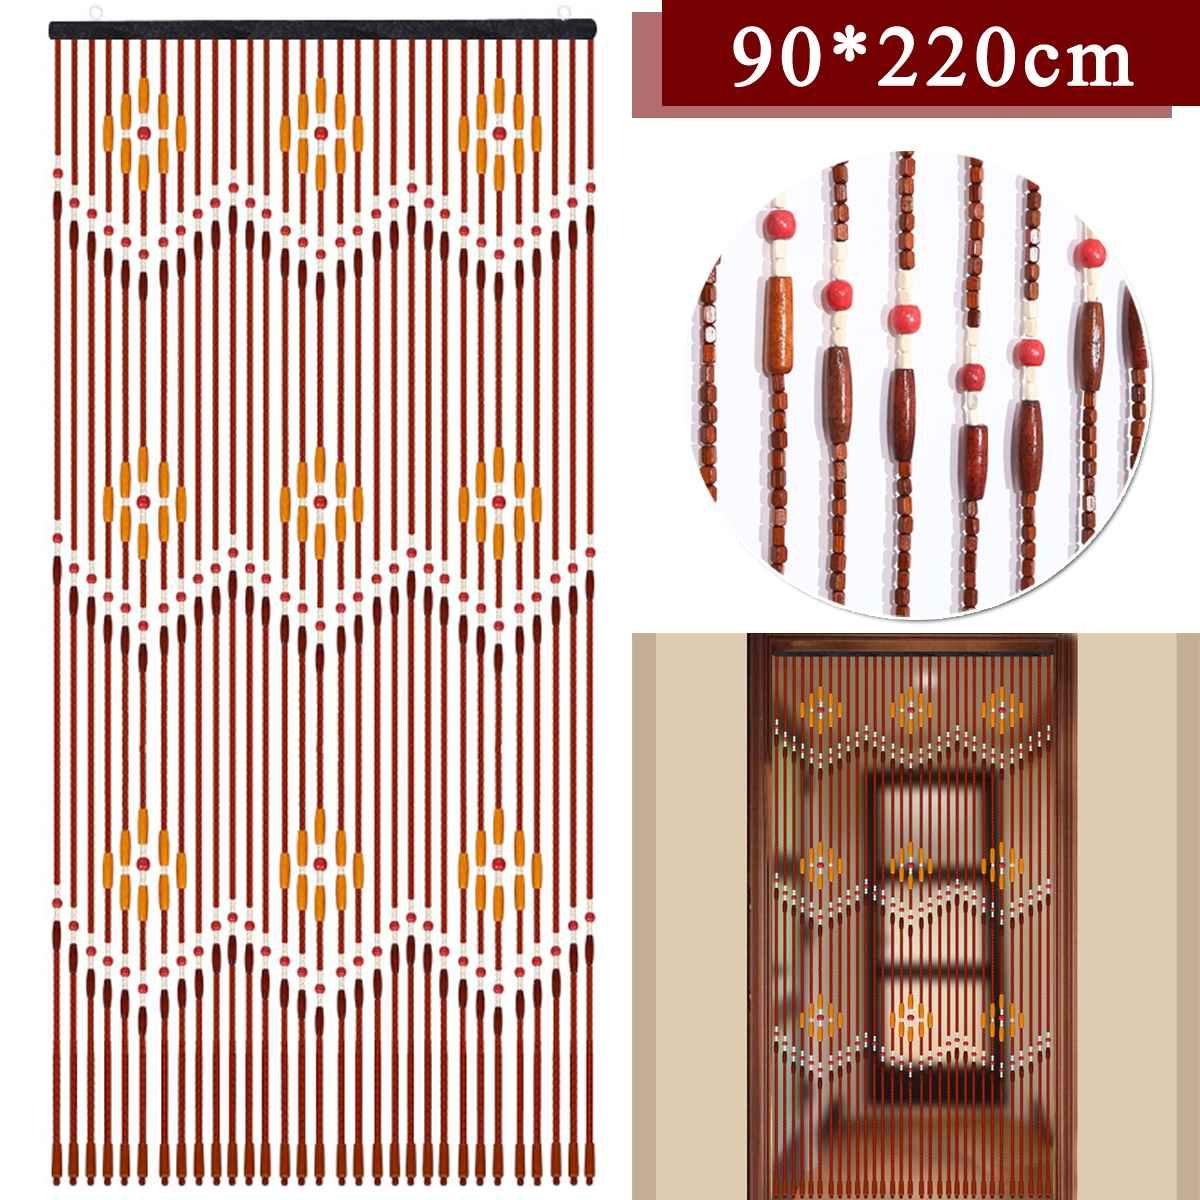 Handmade Wooden Blinds 90x220cm 31 Line Wooden Bead Curtains Fly Screen Gate Divider Sheer For Hallway Living Room Door Window